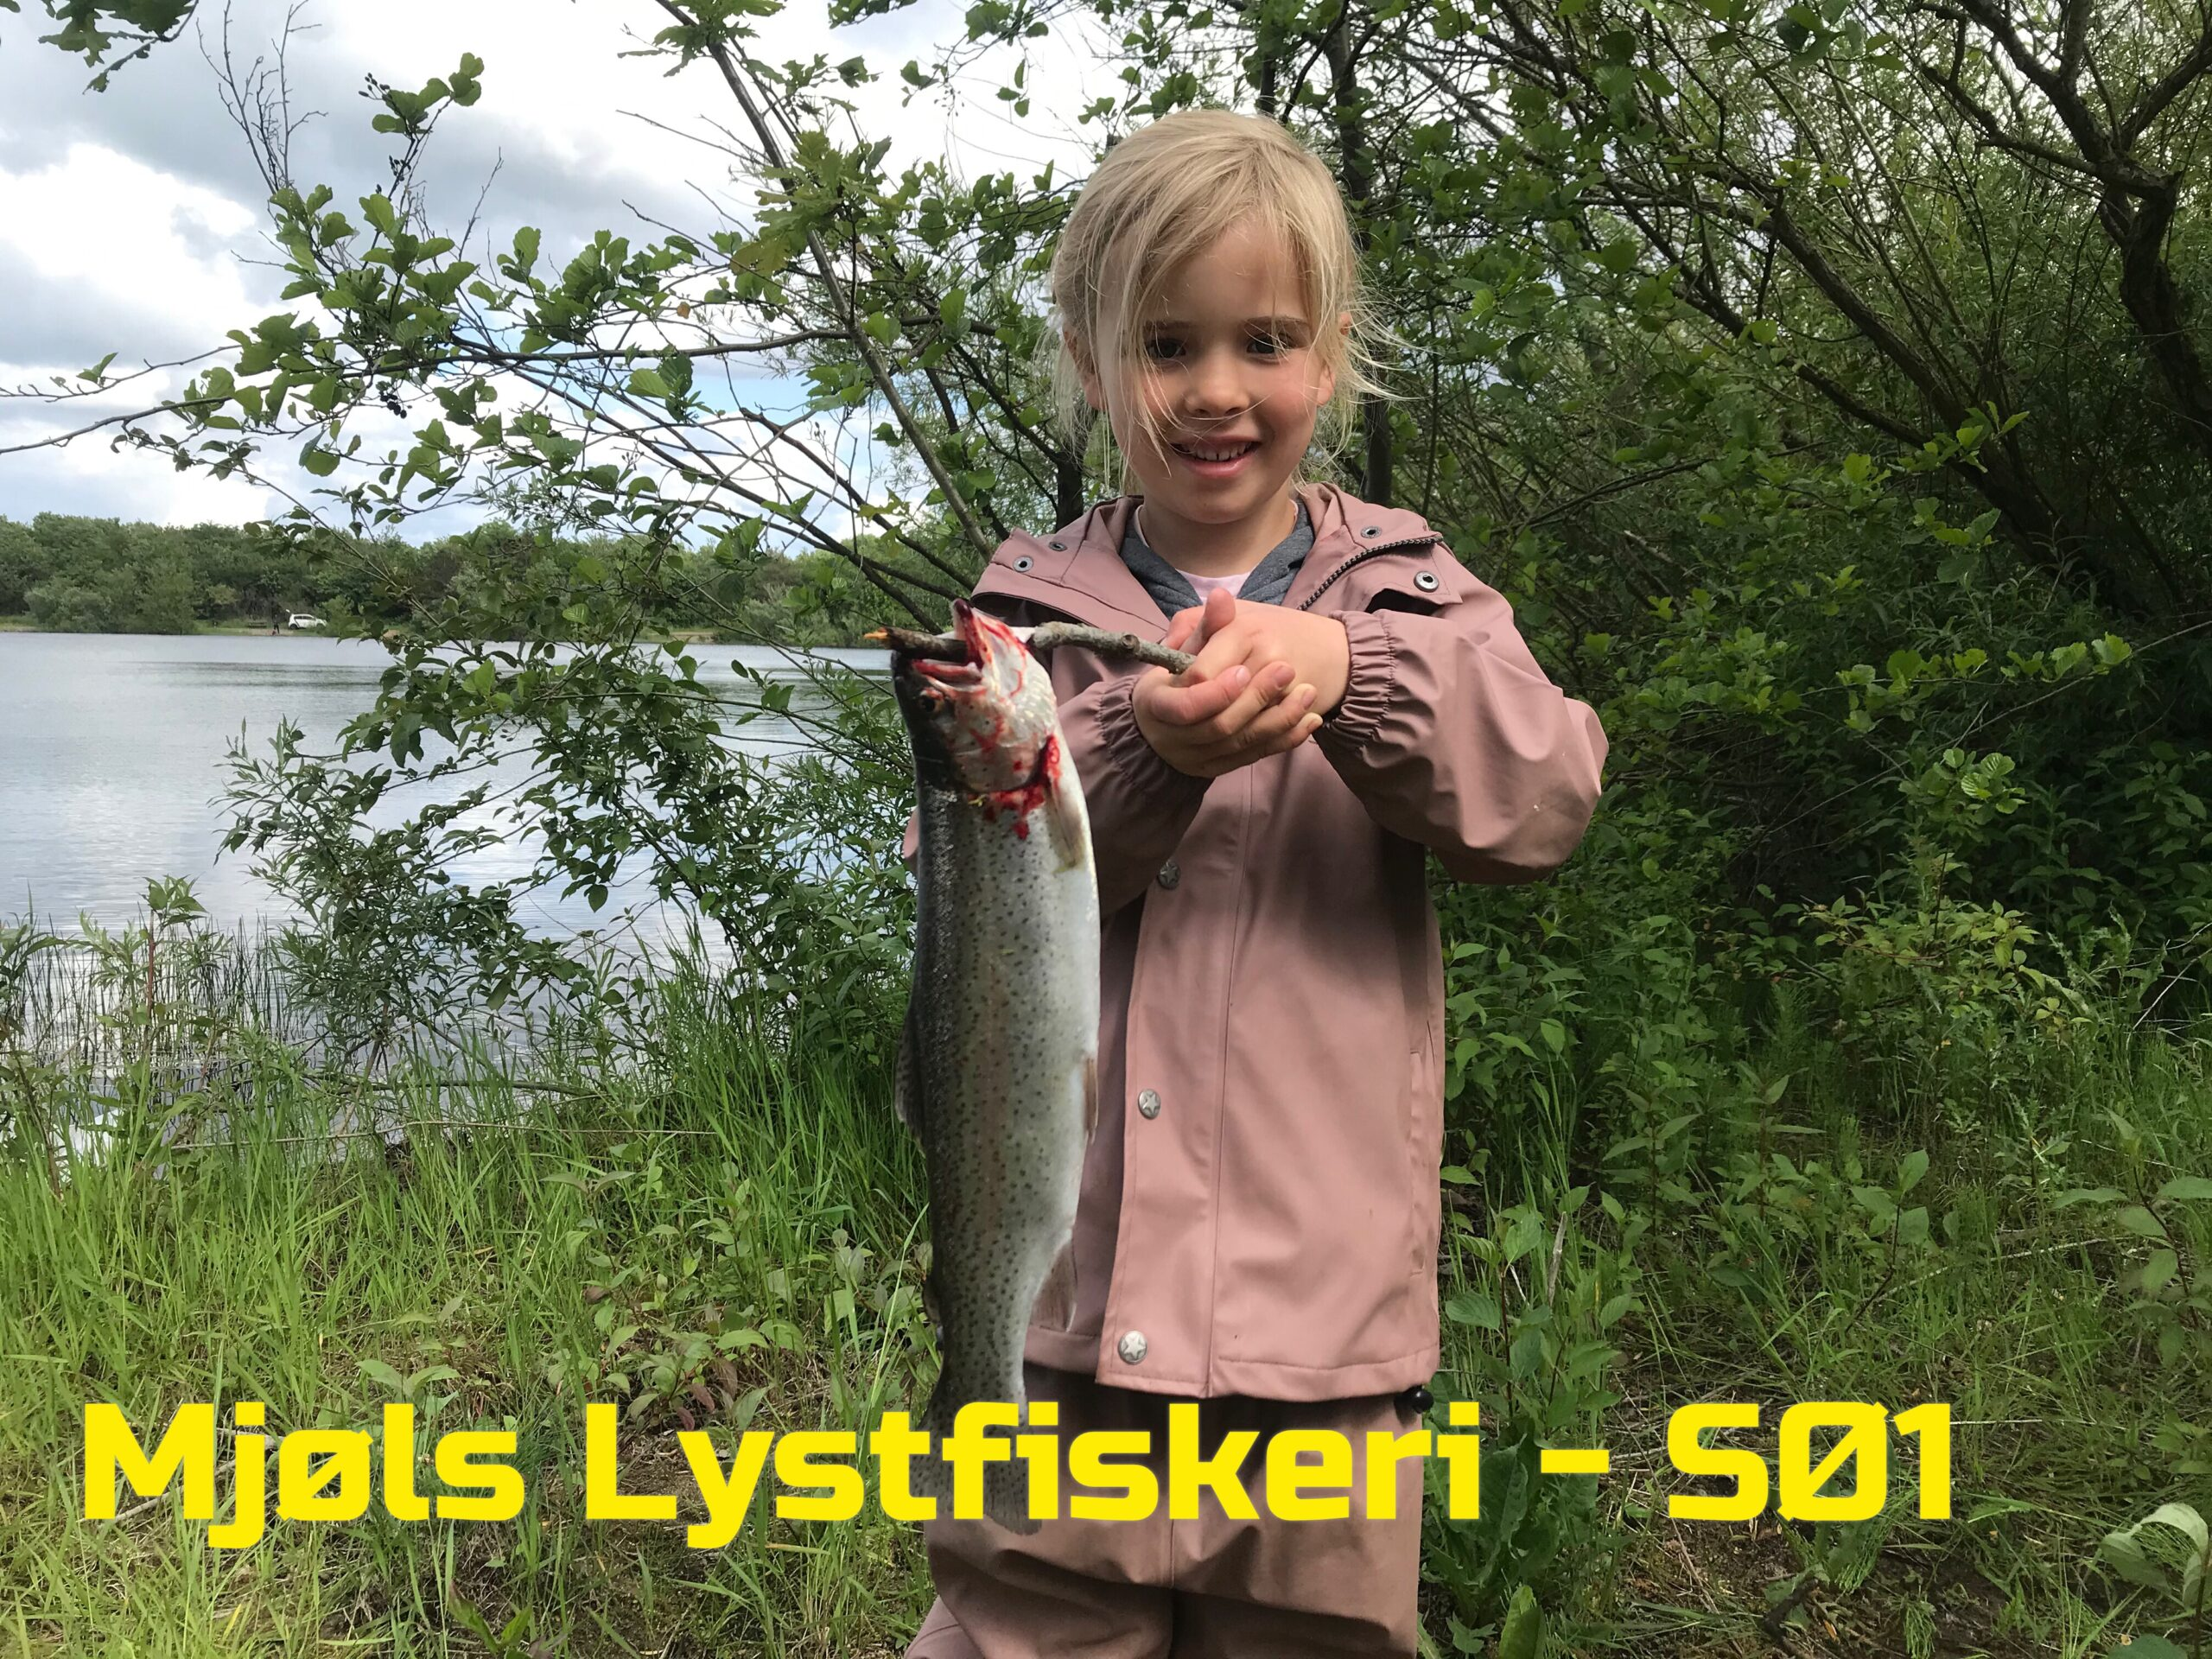 Unge Vigga fik fisk på krogen i Mjøls